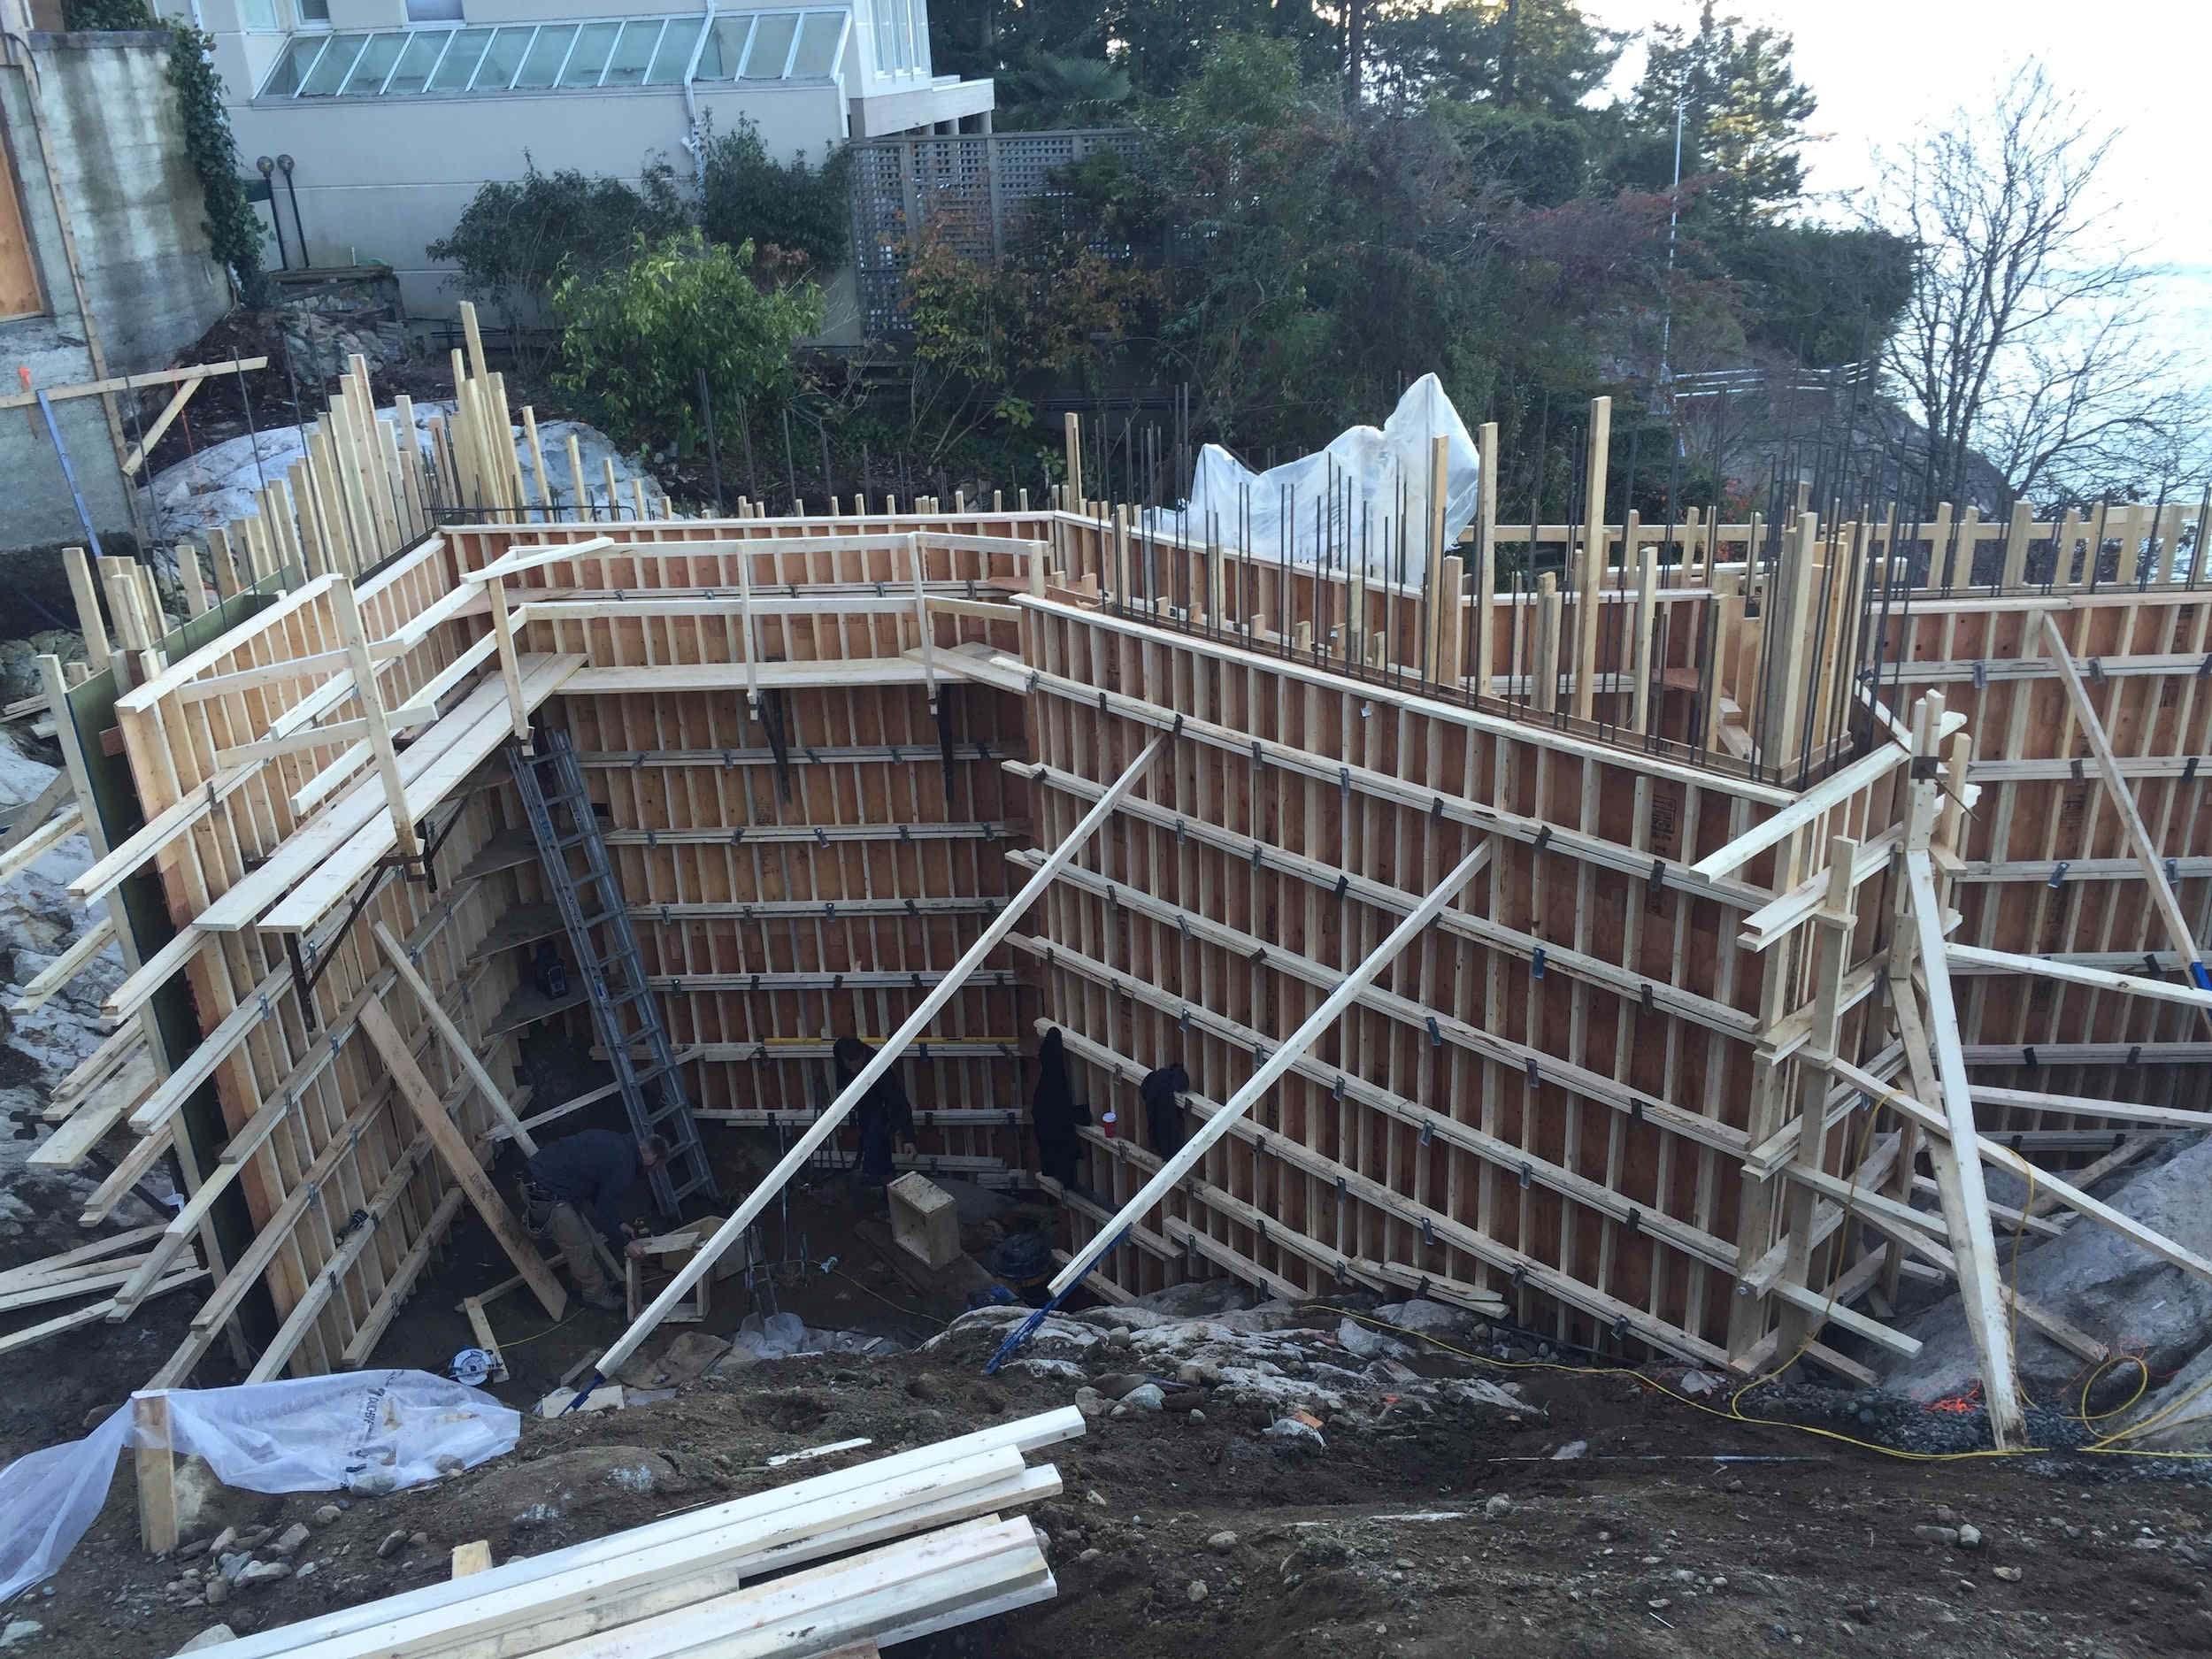 Postle_Construction_ConcreteForming16.jpg